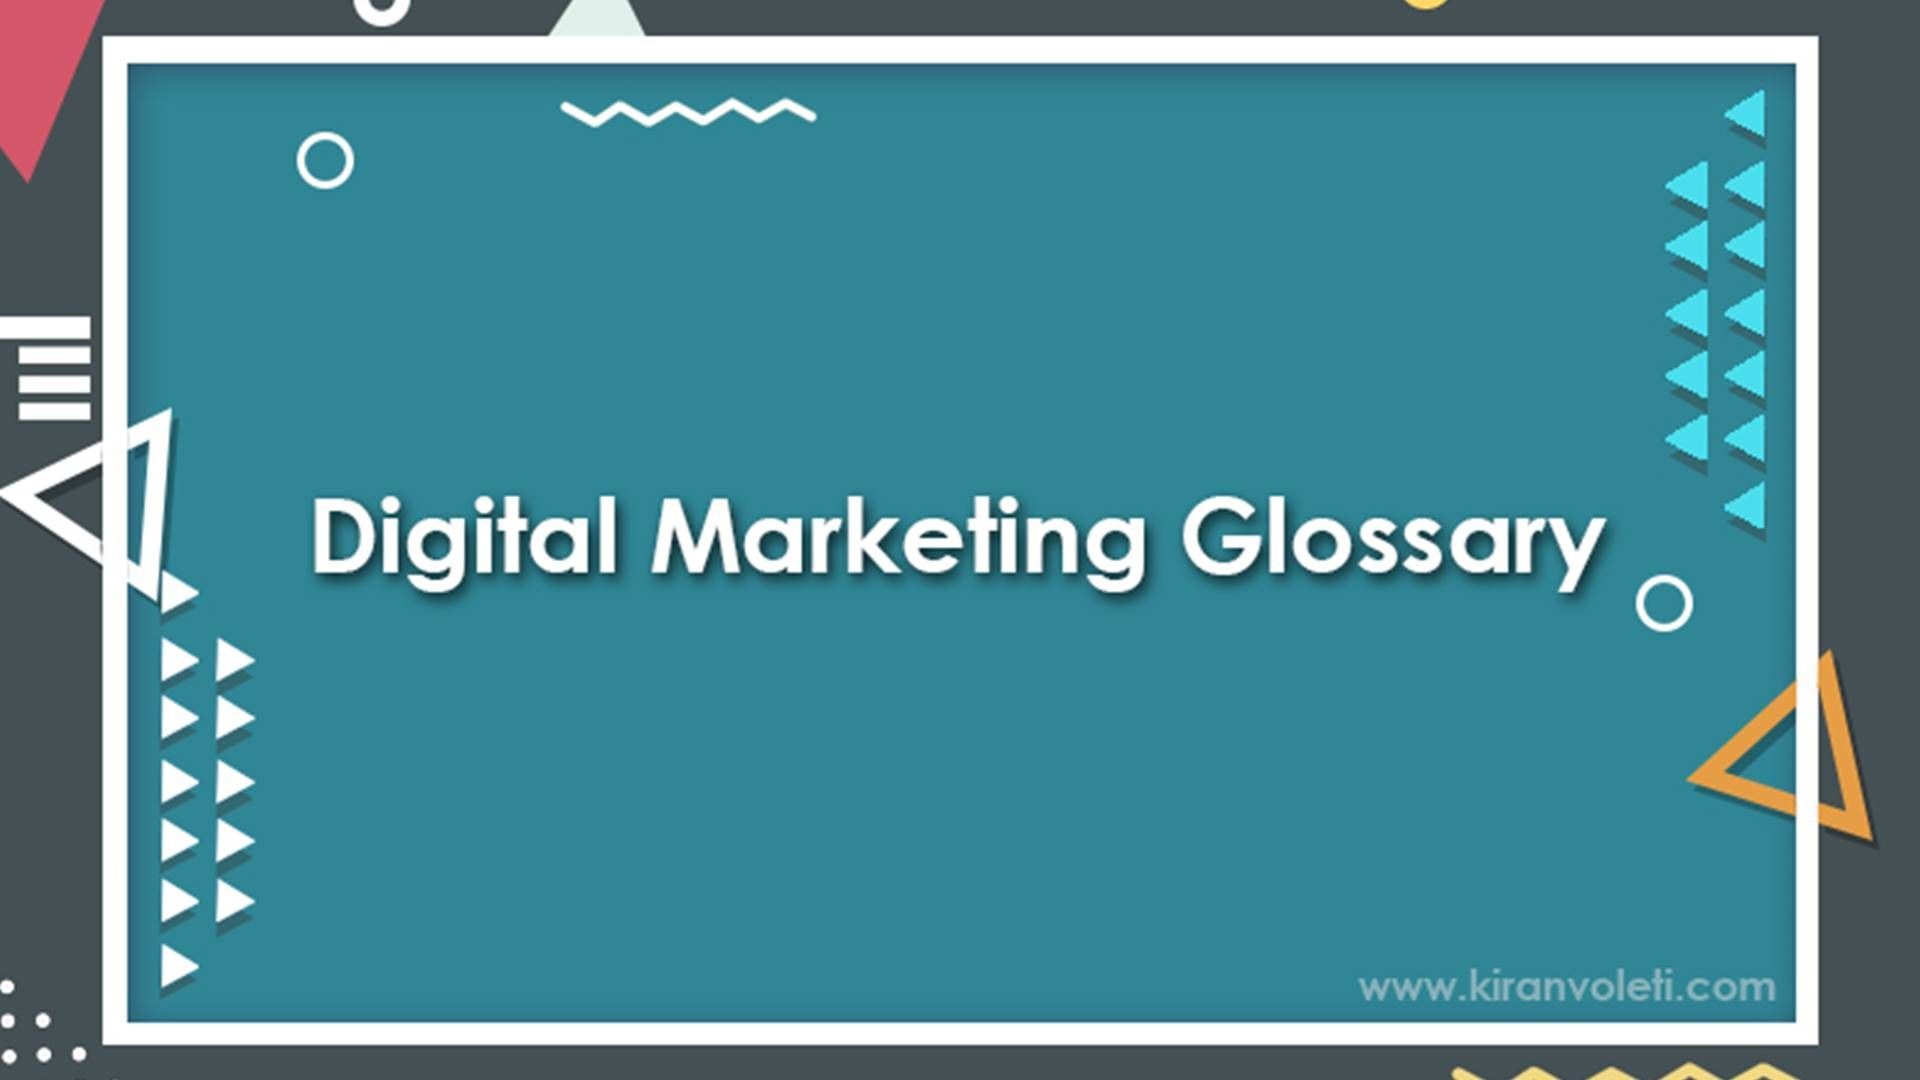 Digital Marketing Glossary